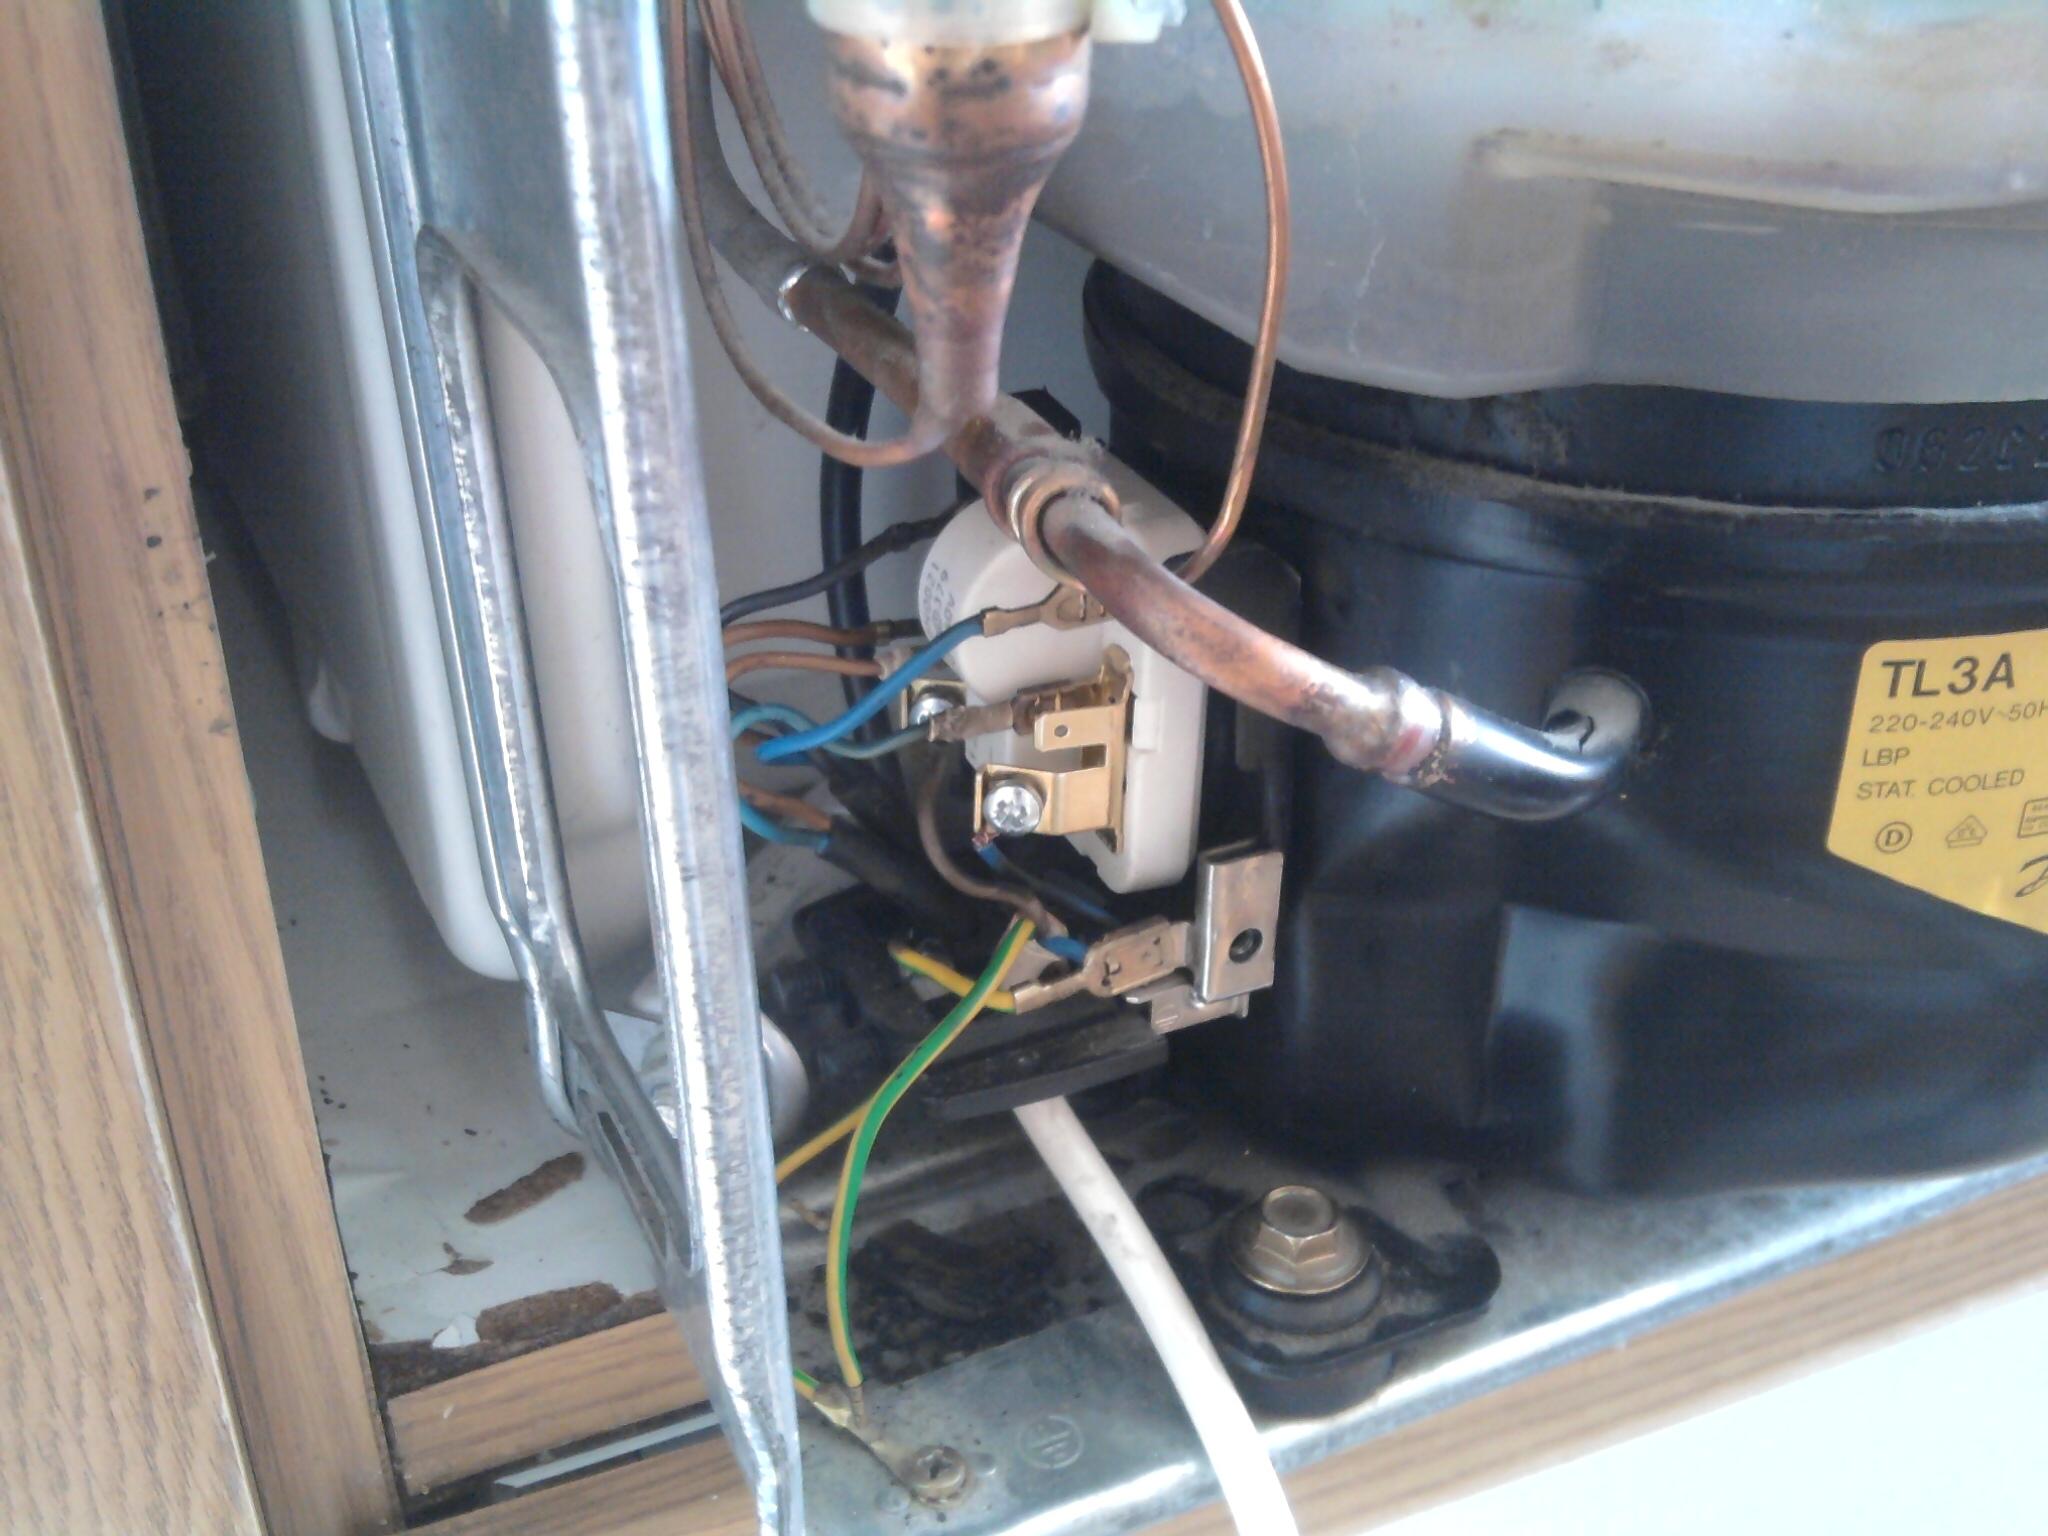 Side By Side Kühlschrank Anschließen : Kühlschrank anschließen umzug von kühlschrank und gefriergerät